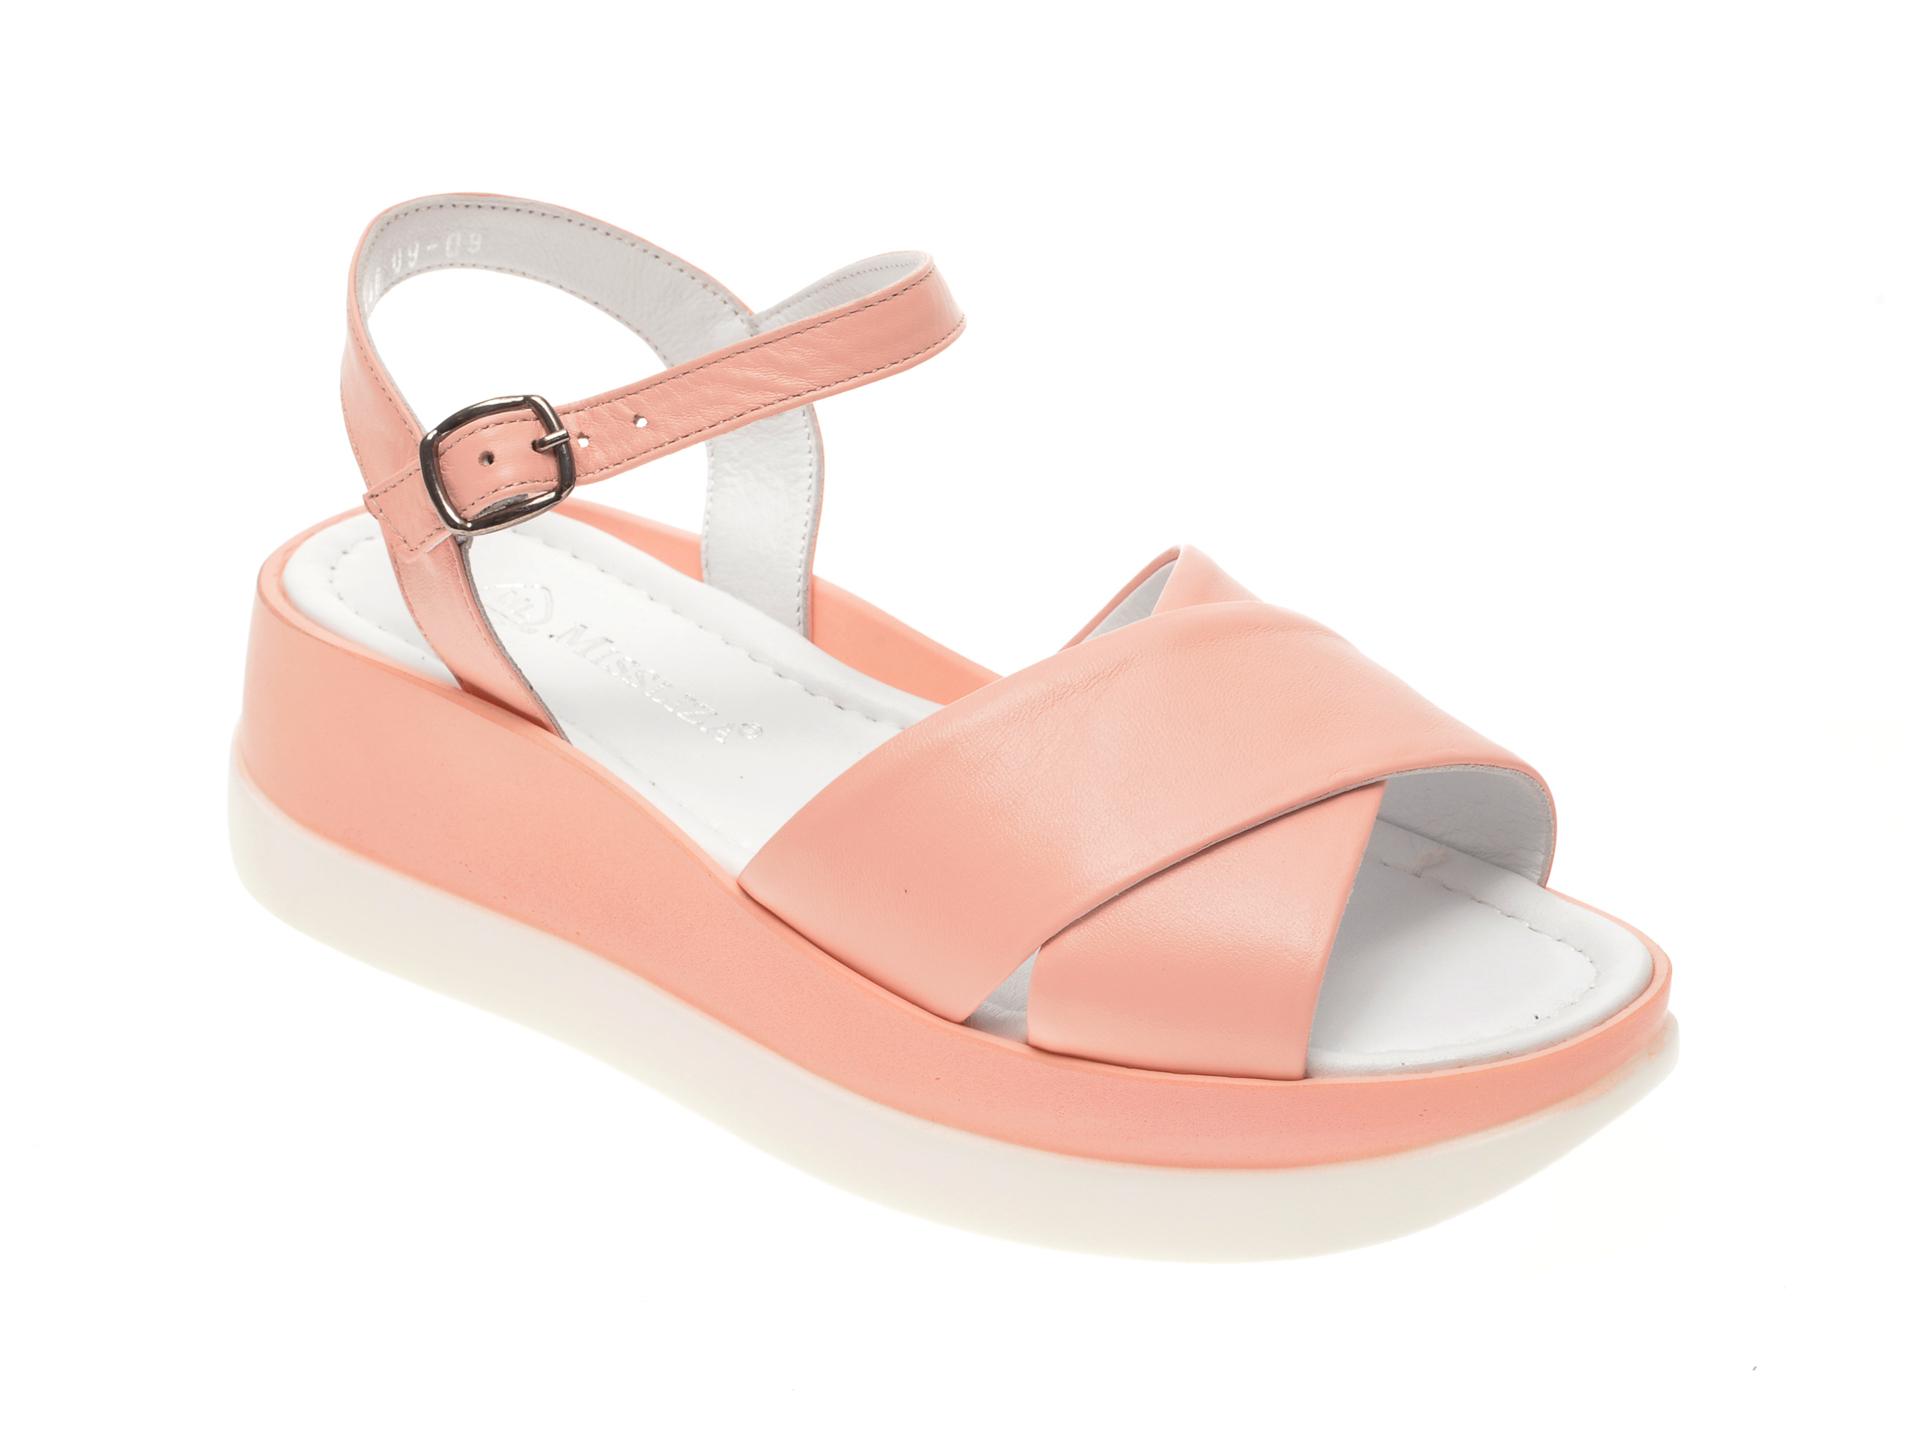 Sandale MISS LIZA roz, 1182440, din piele naturala